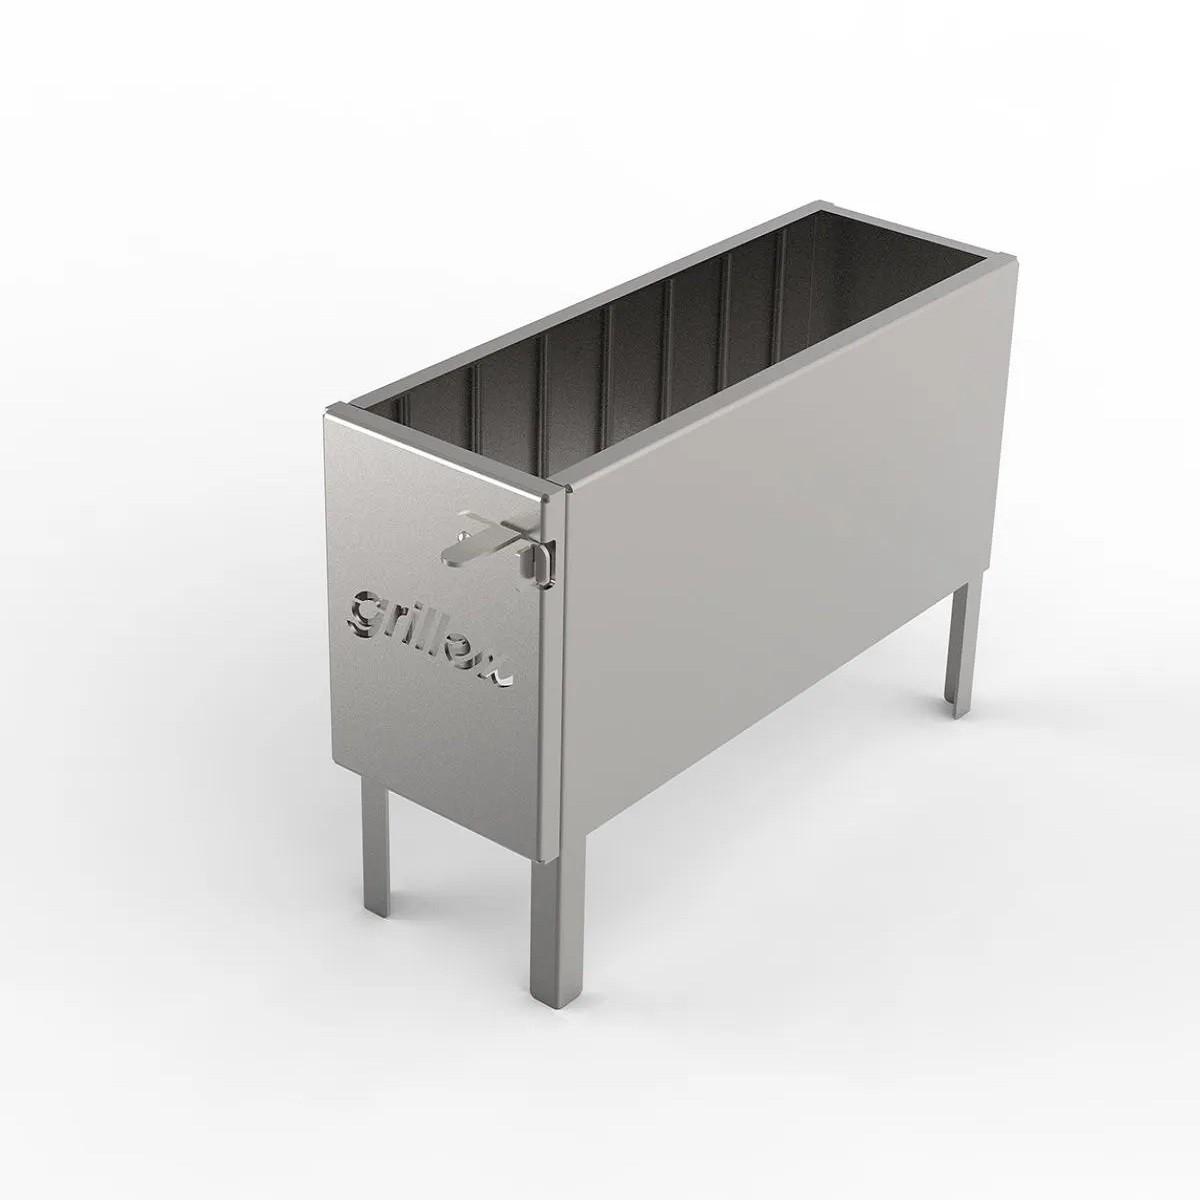 Firebox Grillex em Aço Inox 304 com Tampa  54 x 18,5 cm